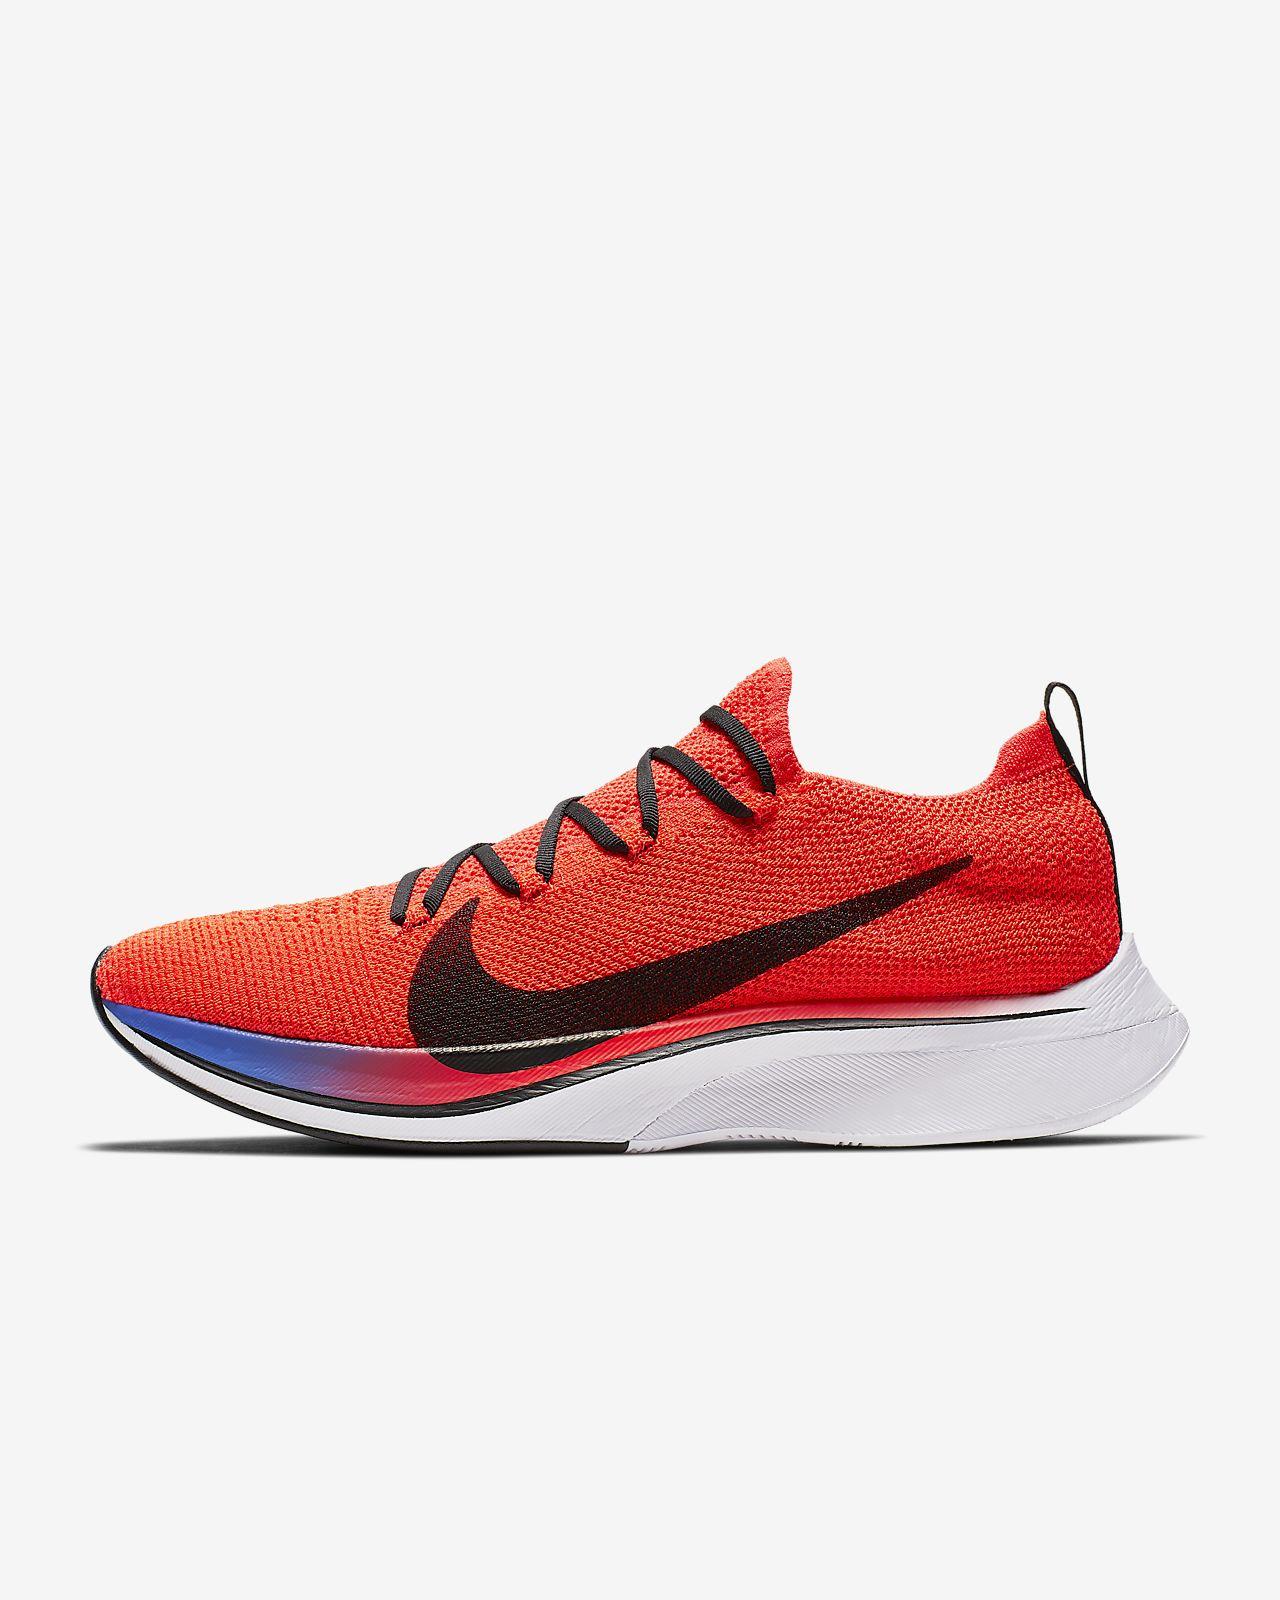 697551bda Calzado de running Nike Vaporfly 4% Flyknit. Nike.com MX